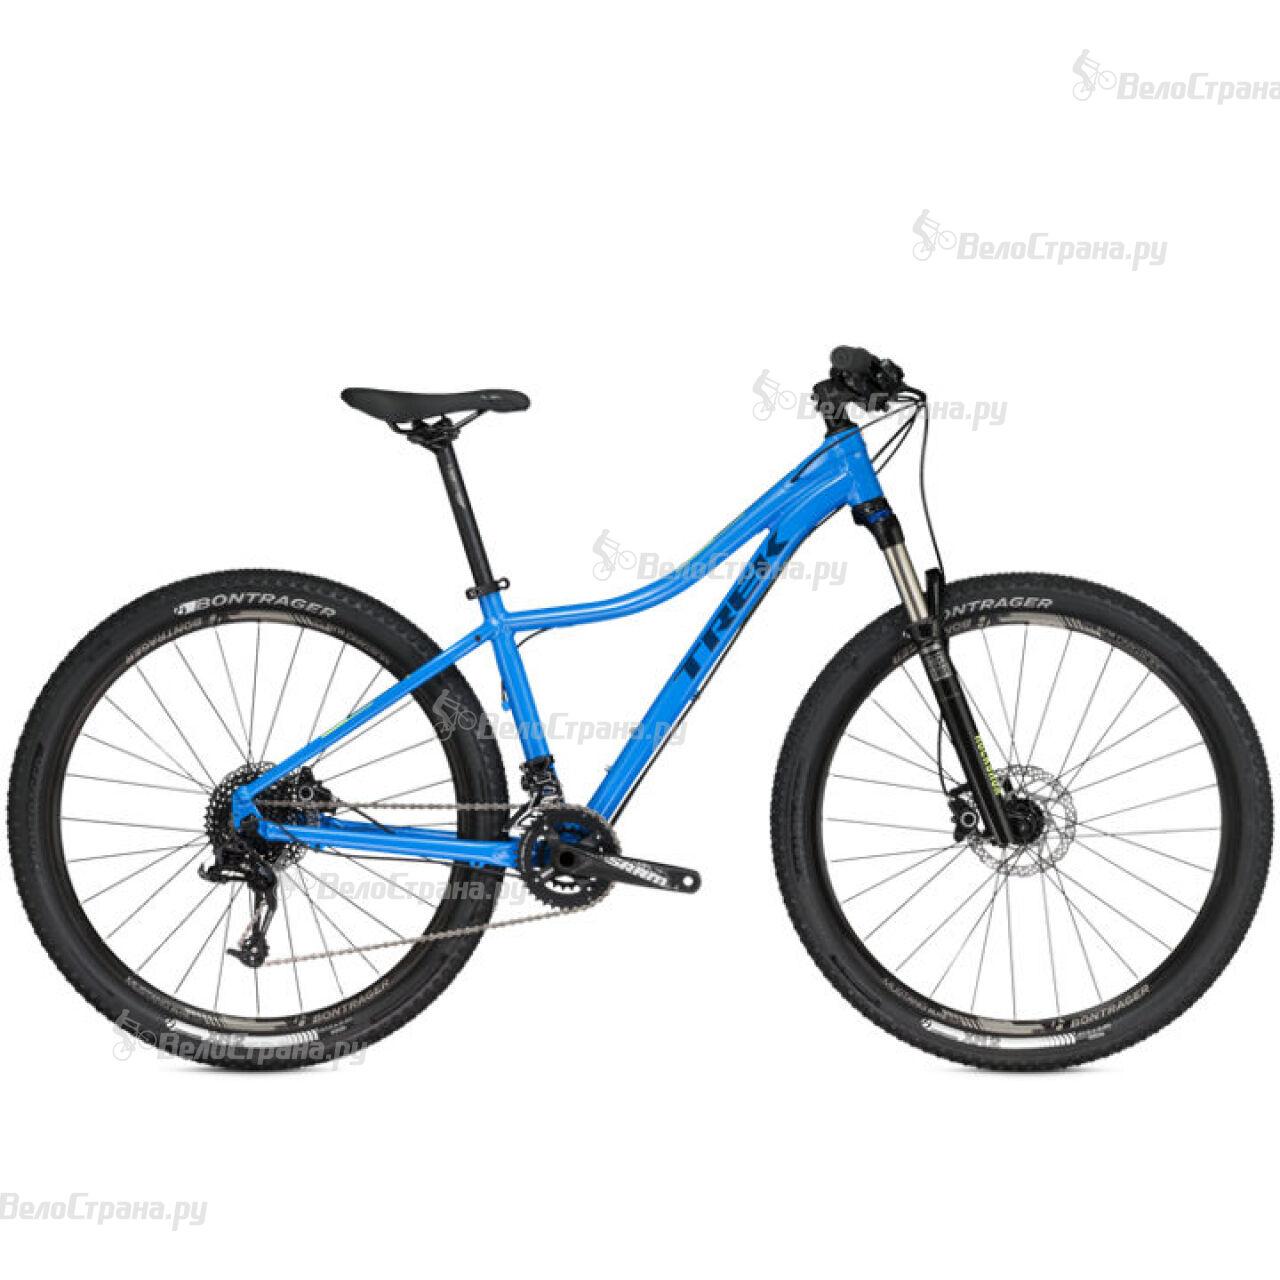 Велосипед Trek Cali SL WSD 29 (2017) велосипед trek madone 3 1 wsd 2013